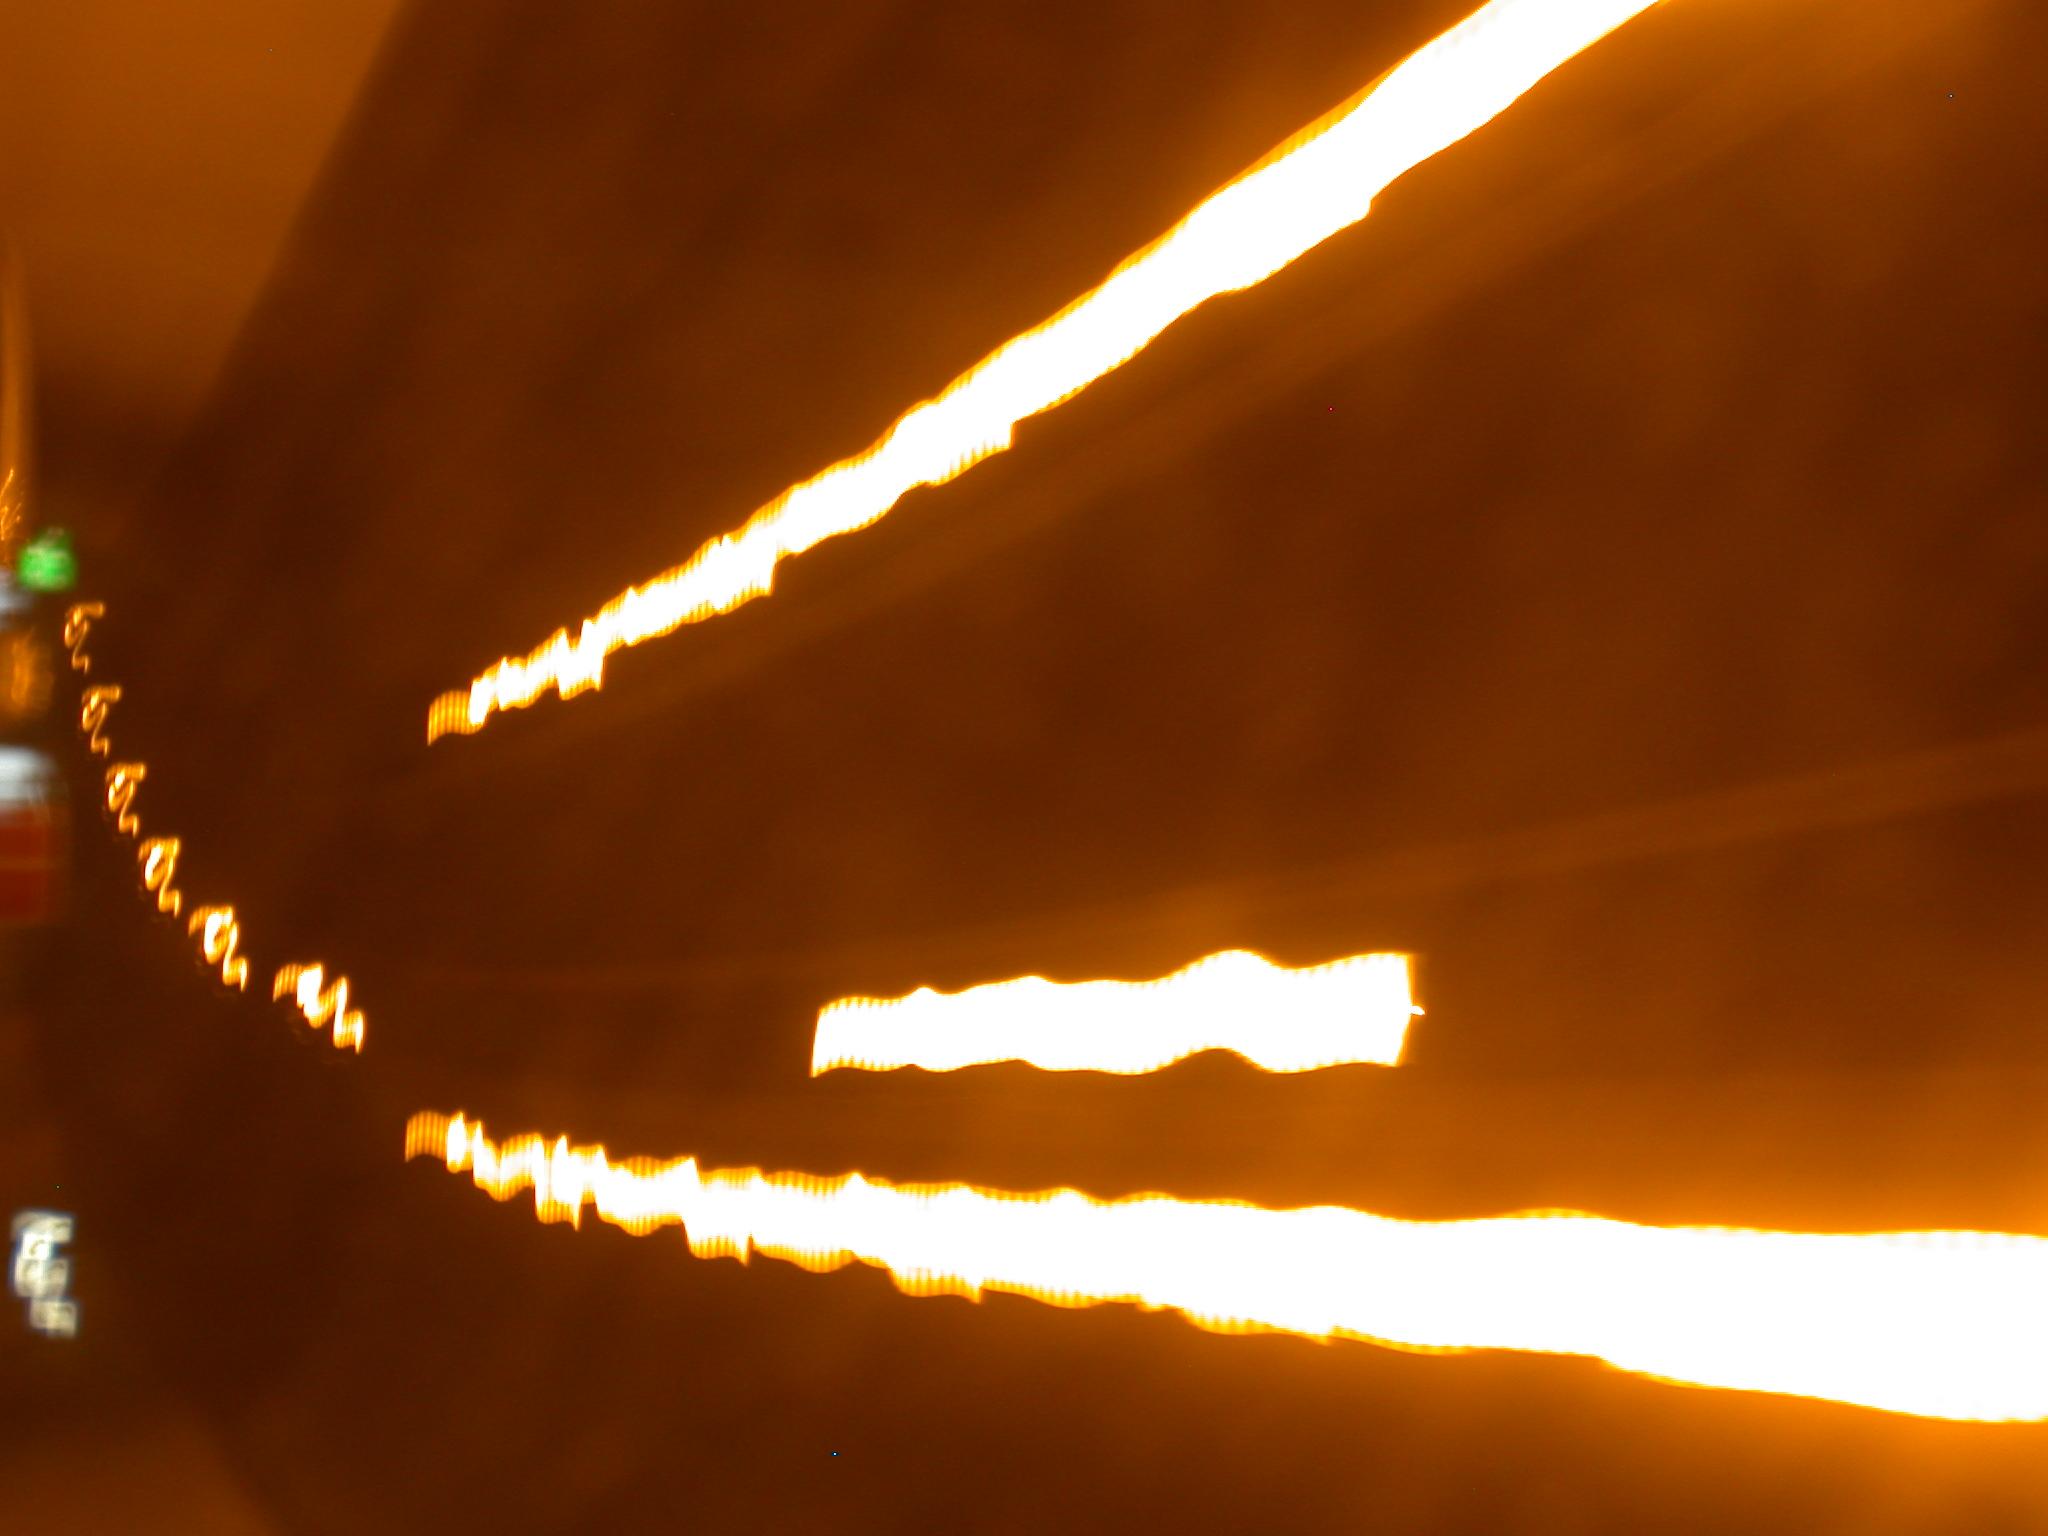 streaks of light orange speed